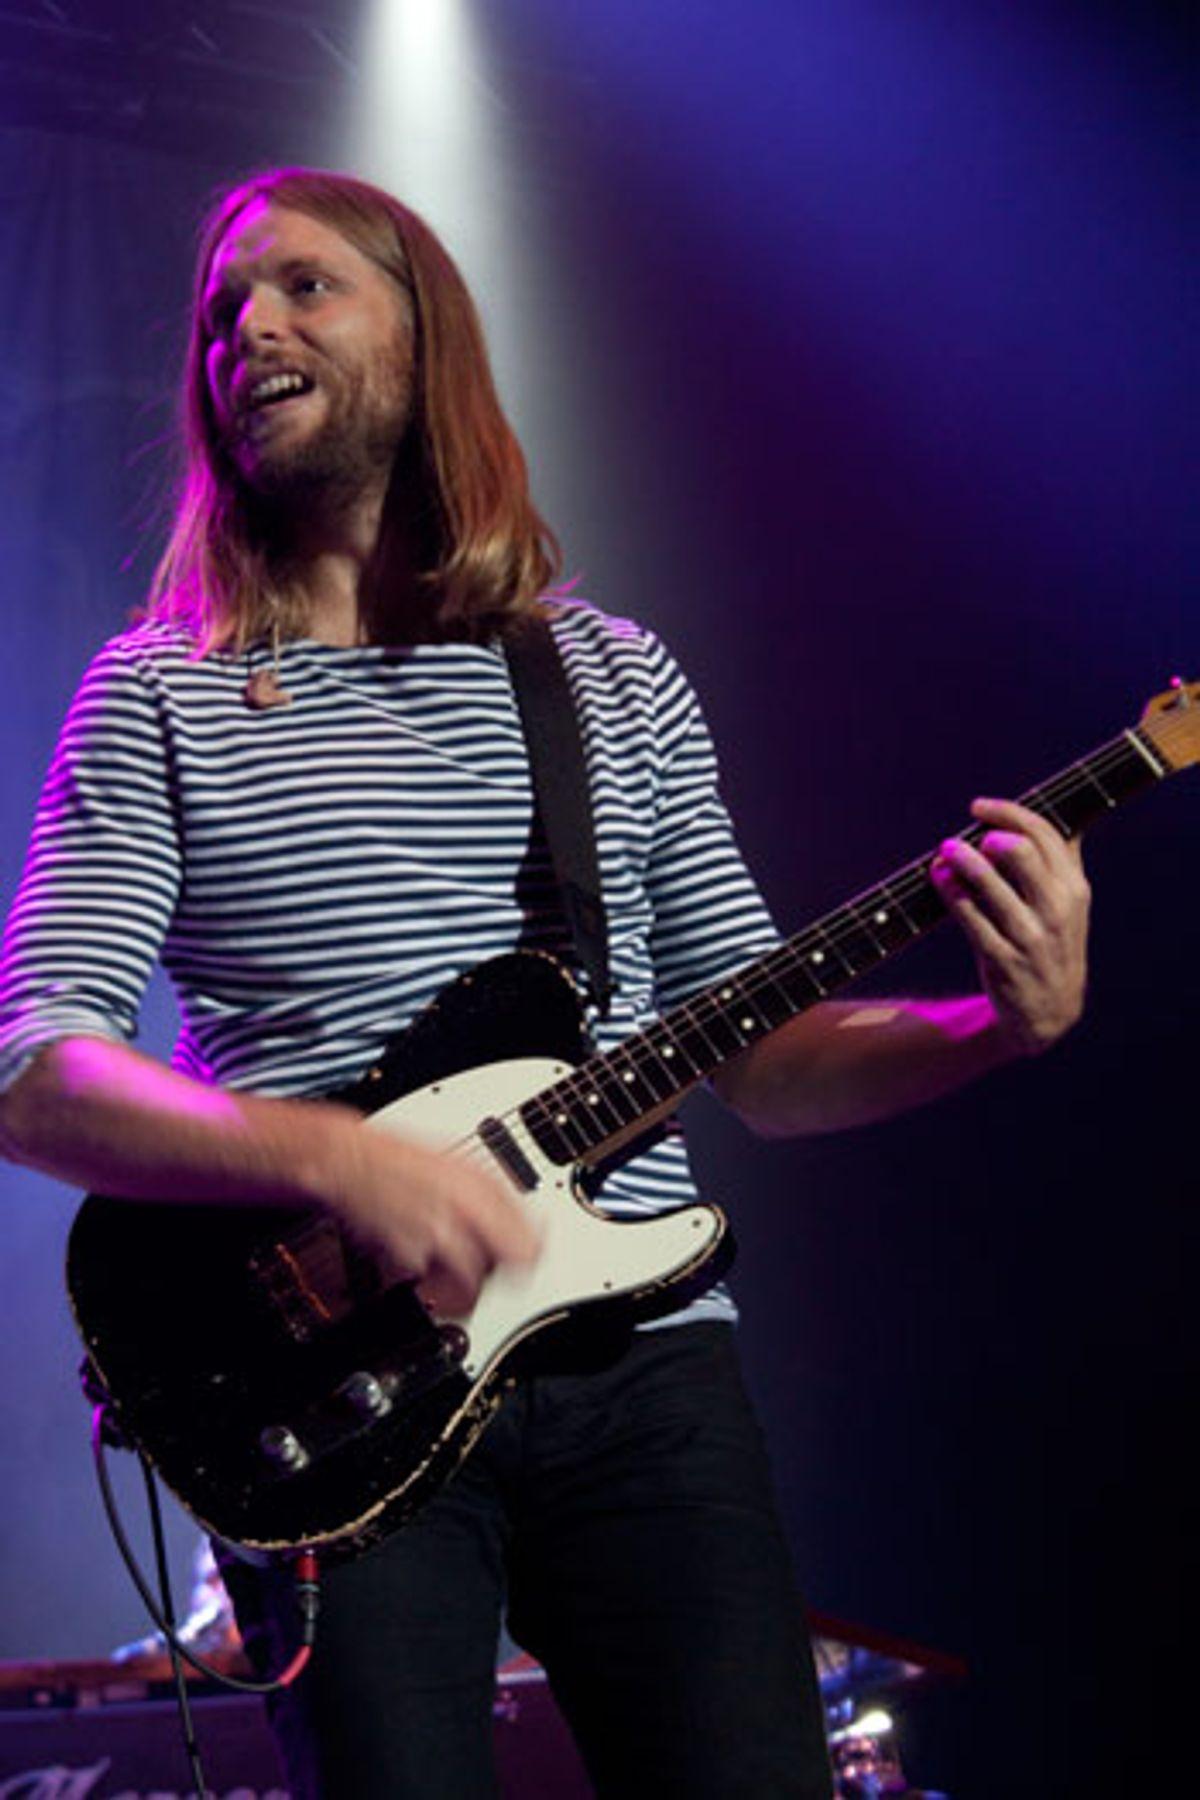 Interview: James Valentine (Maroon 5) - Hands All Over